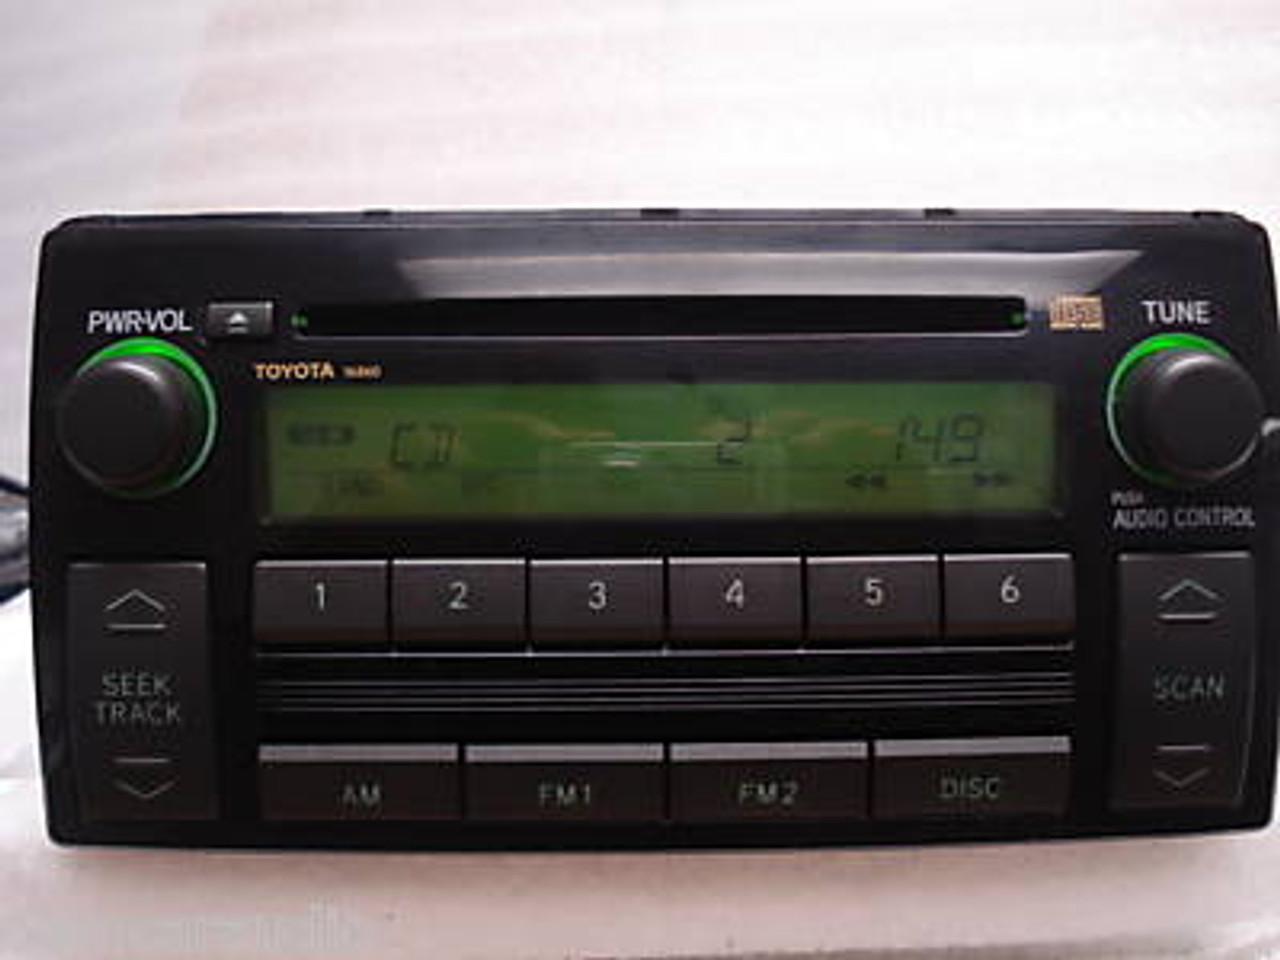 Toyota Camry Radio and CD Player 86120-AA160 2005-2006 on